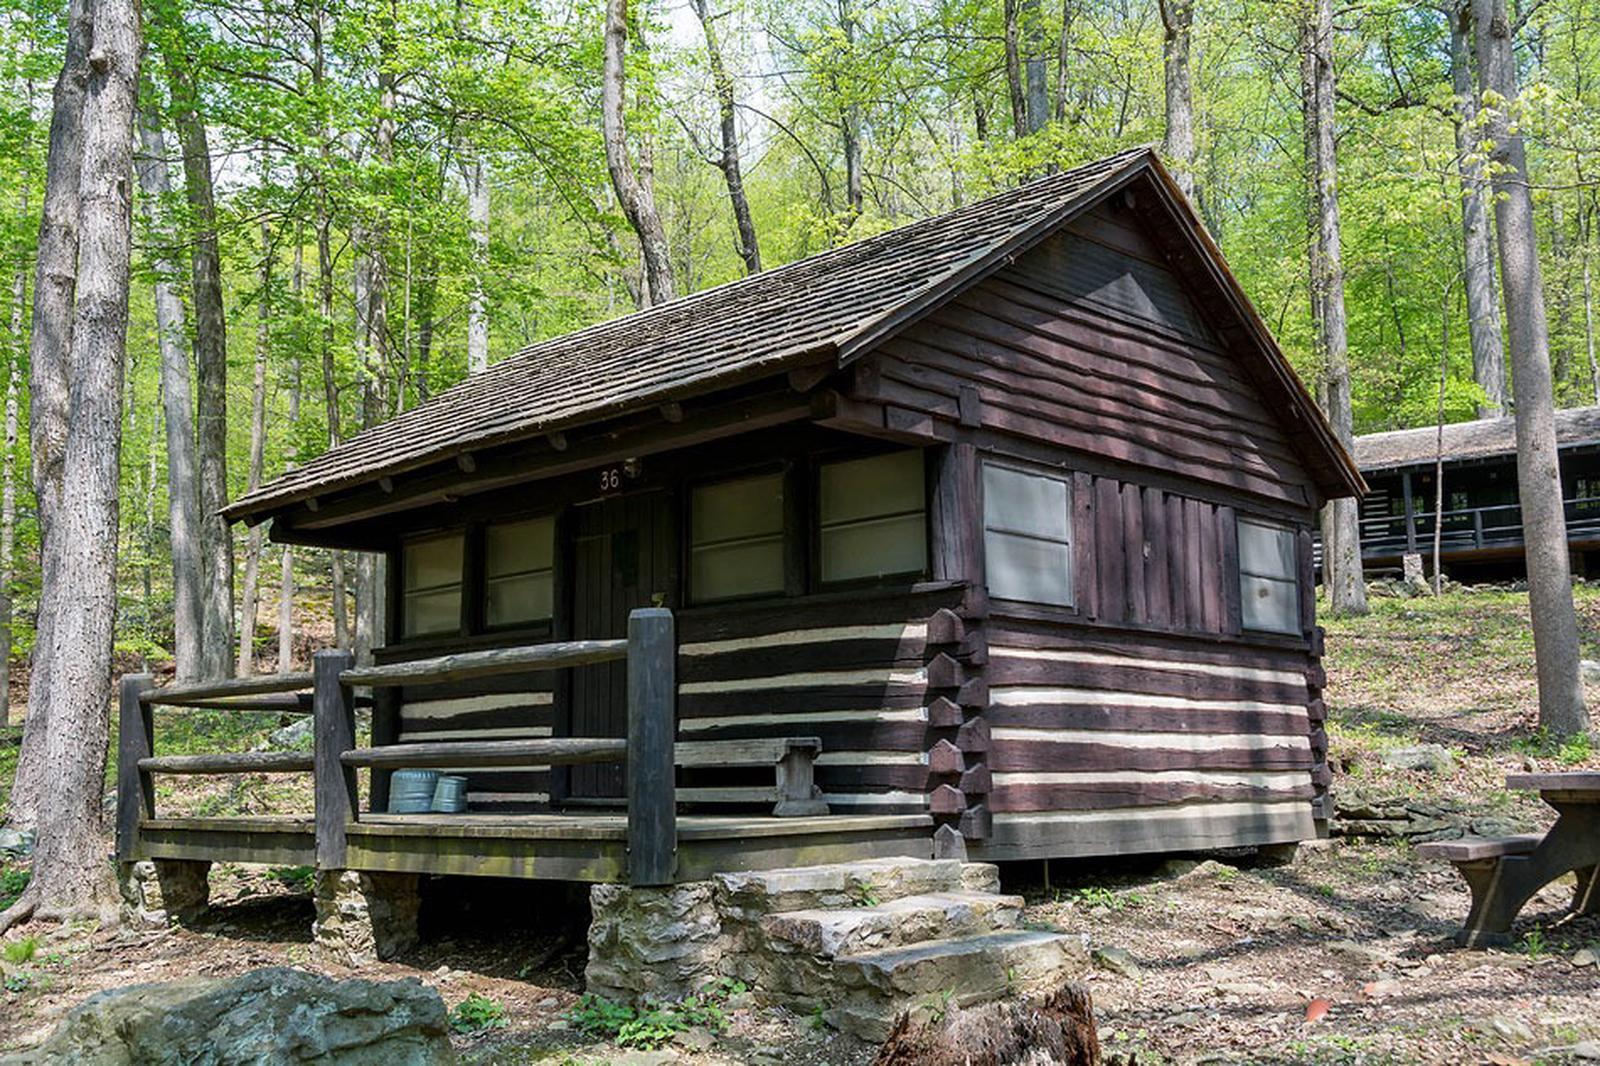 Camp Misty Mount Cabin 36